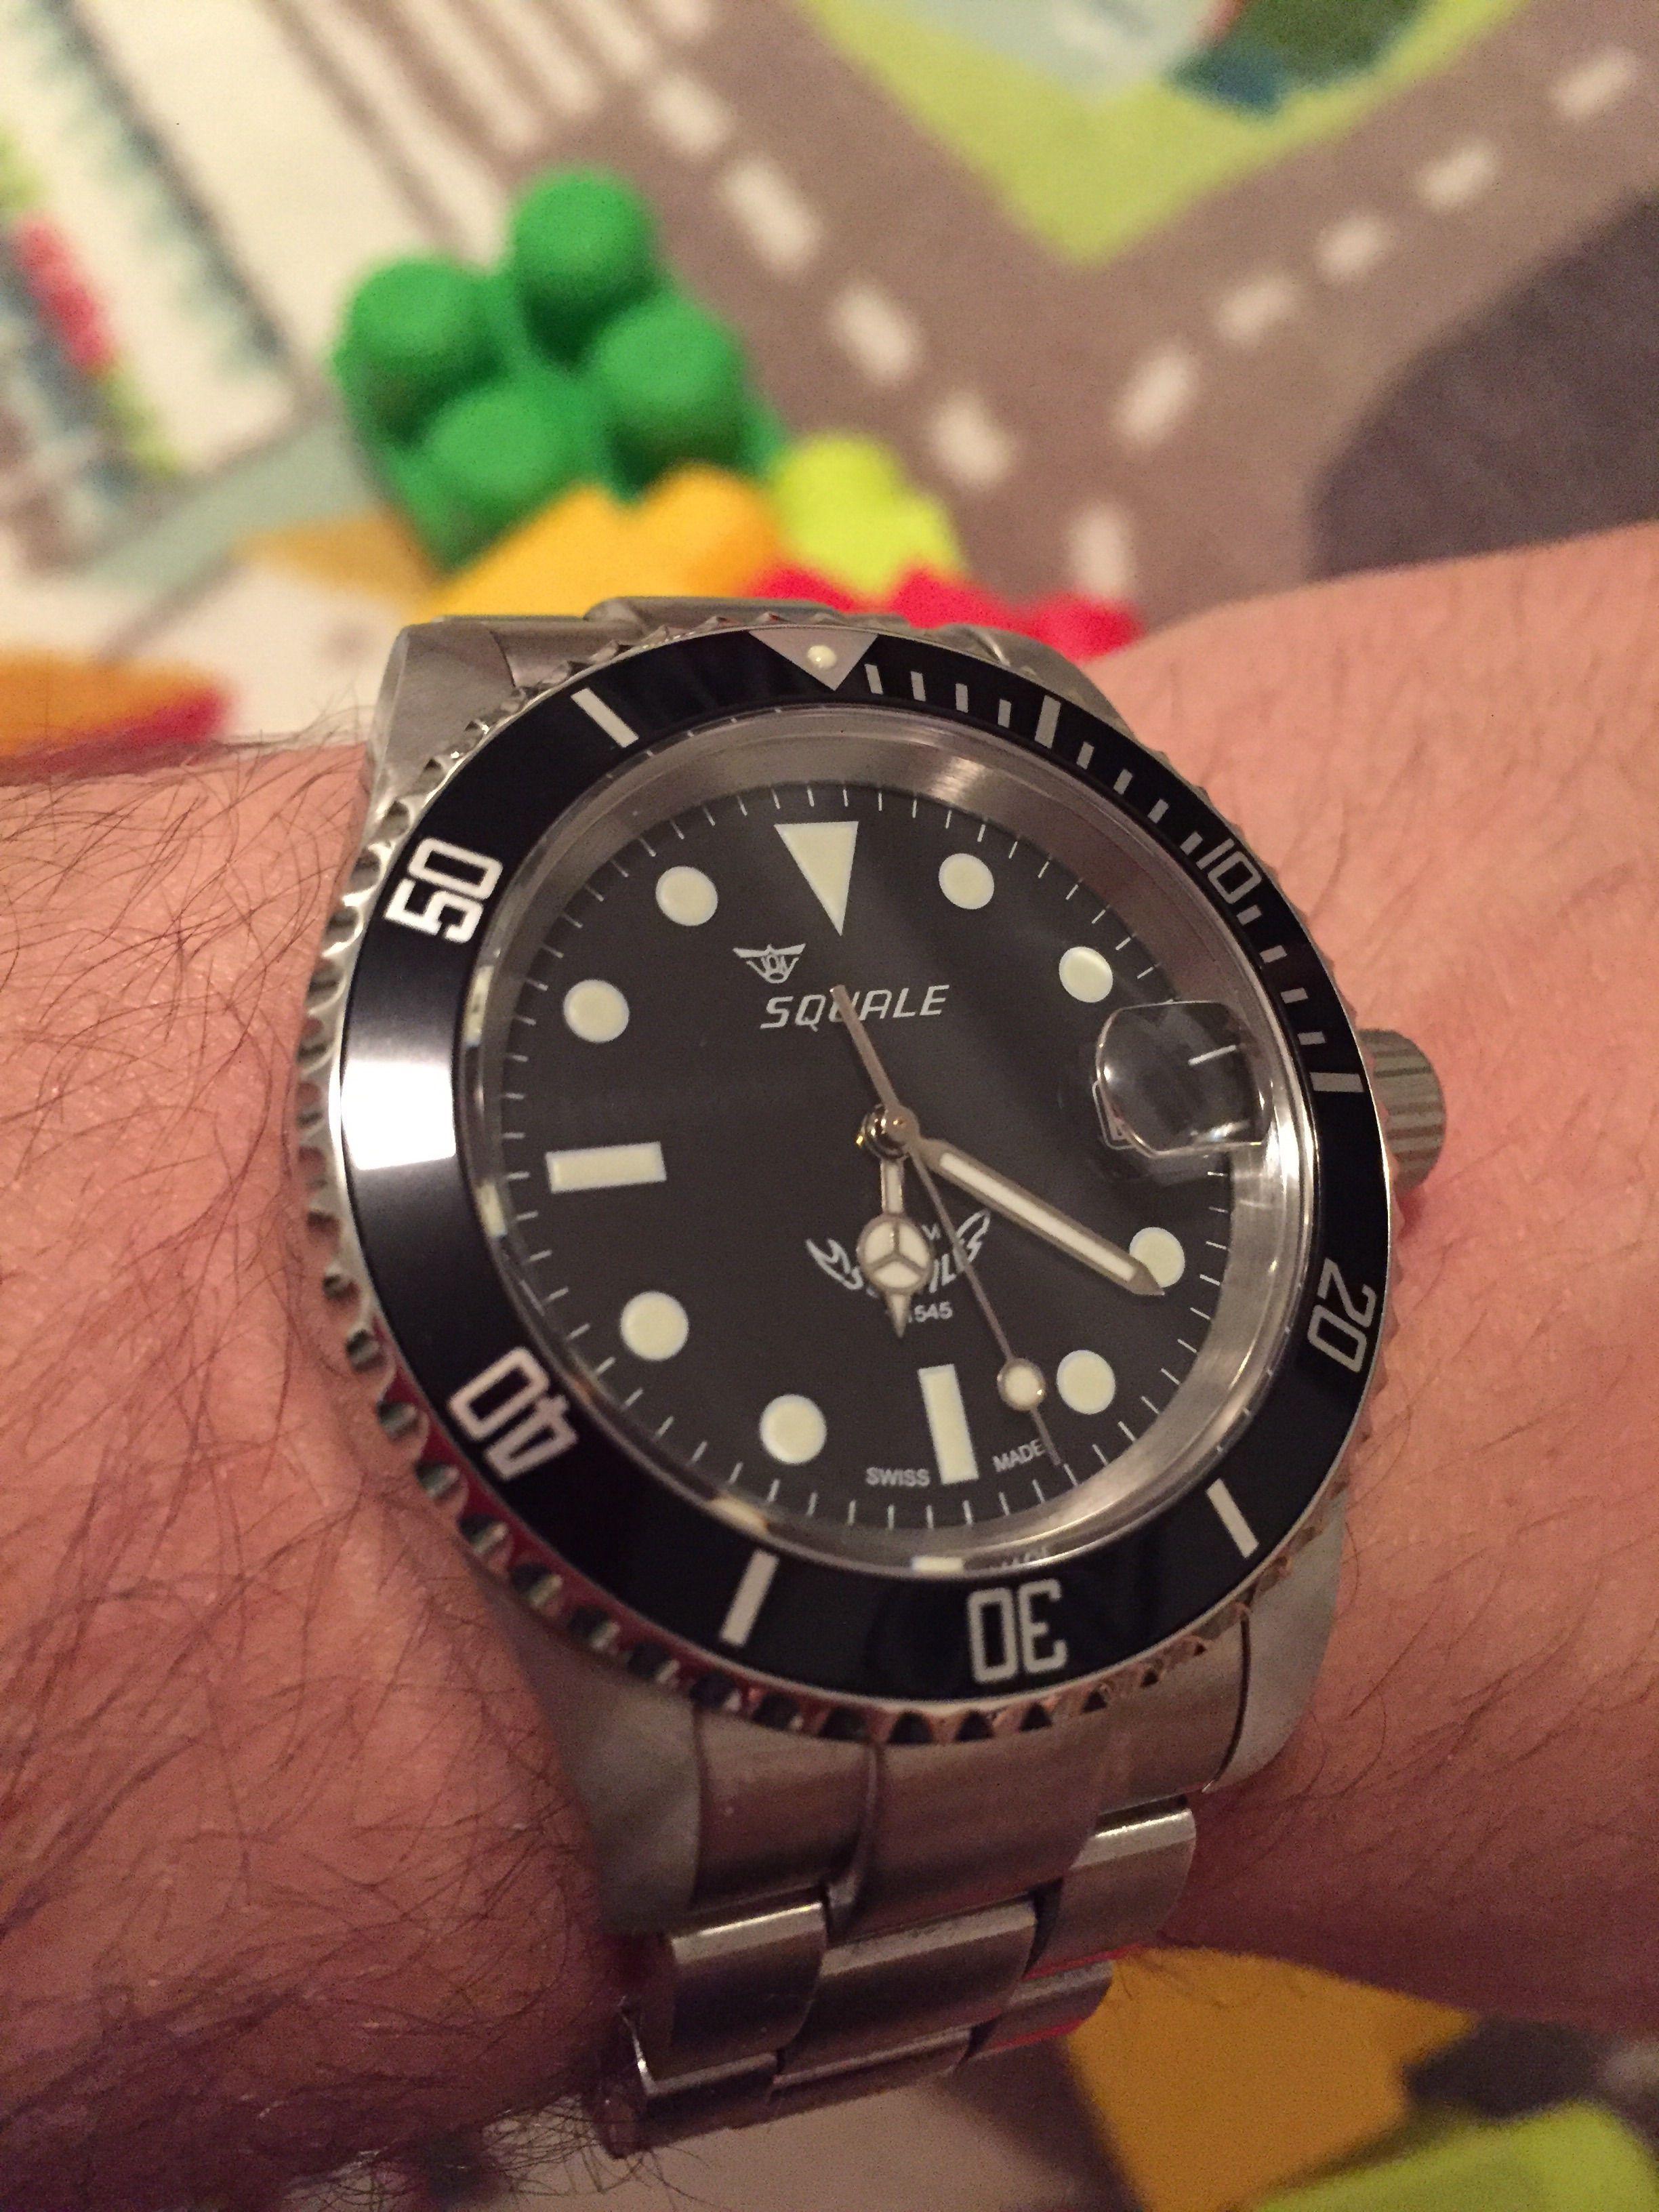 CBrown85's photos in Poor man's watch thread